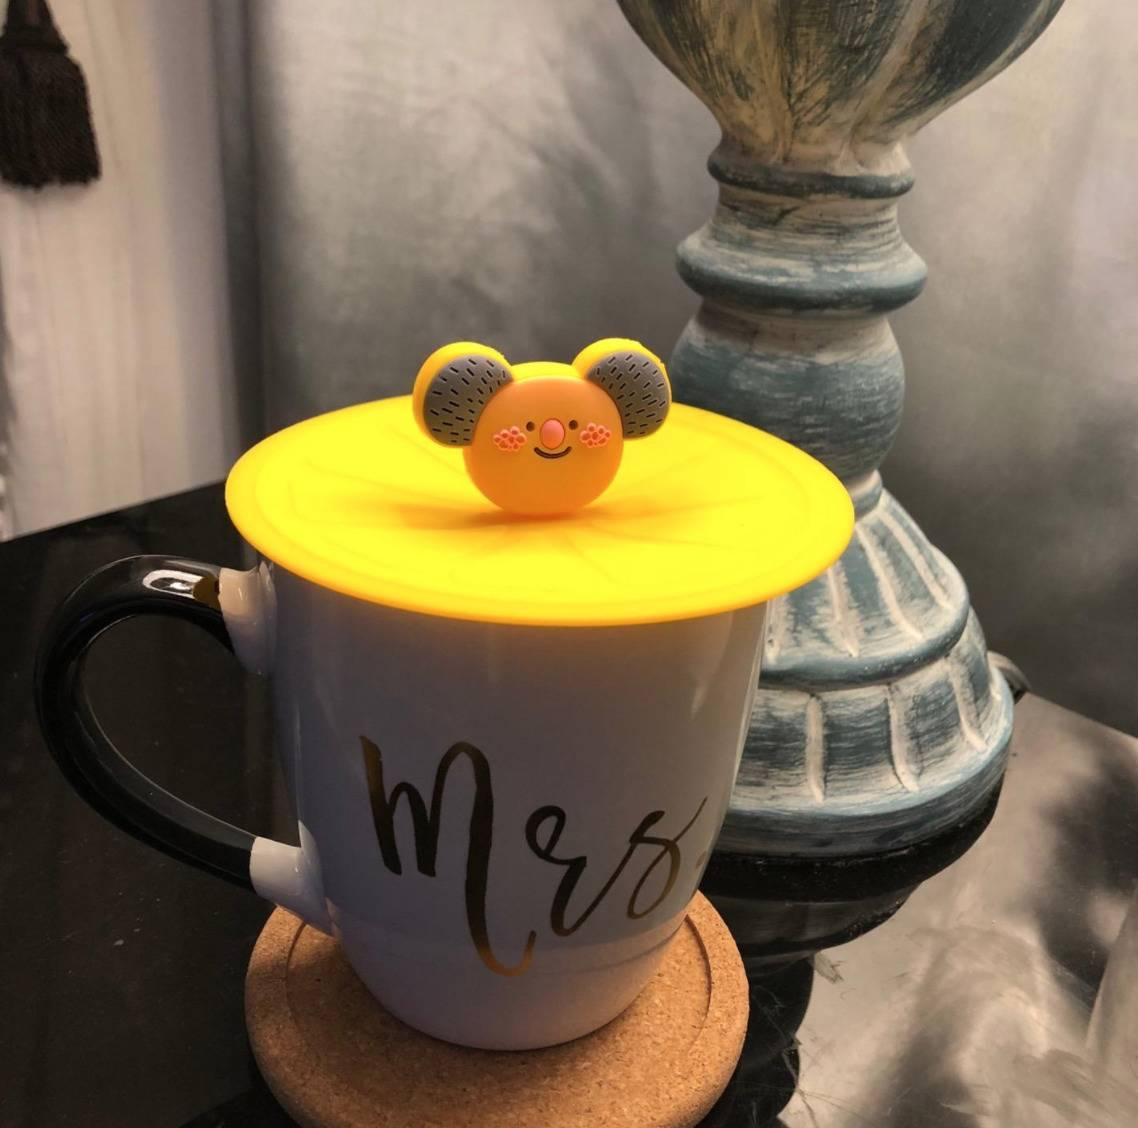 the kola top on a tea mug